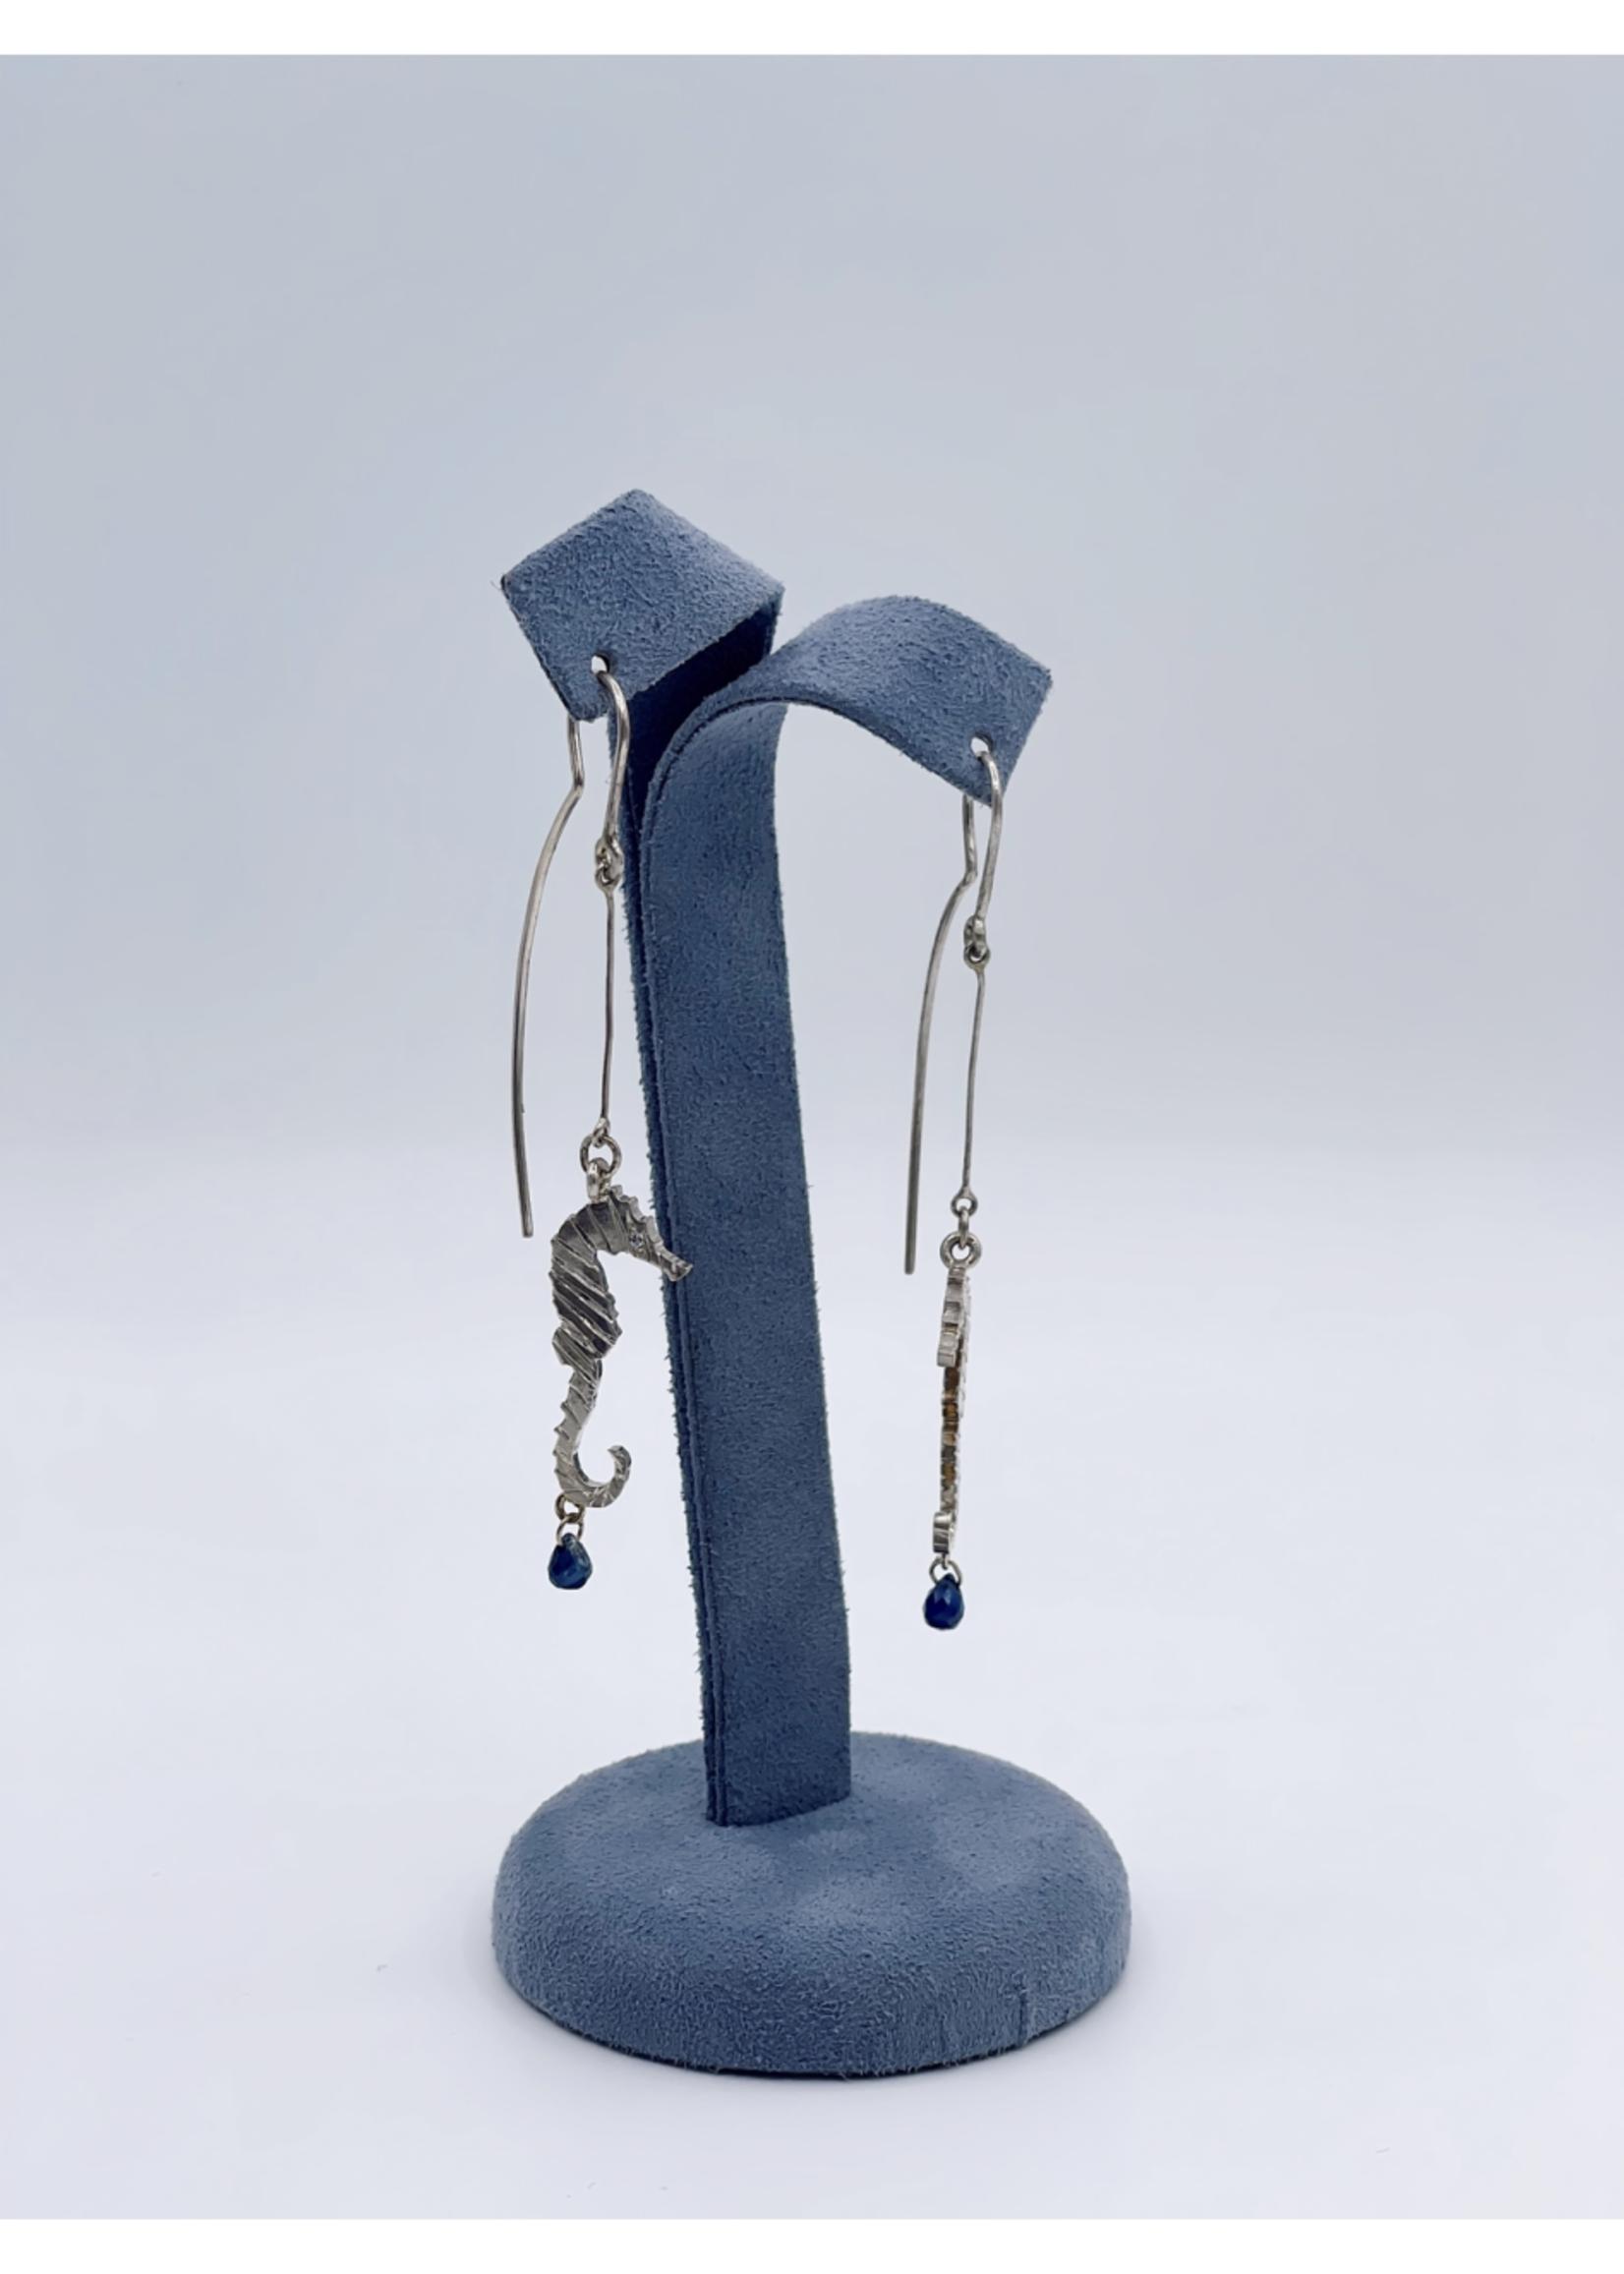 CJ Designs Seahorse Earrings with Diamond, Sapphire